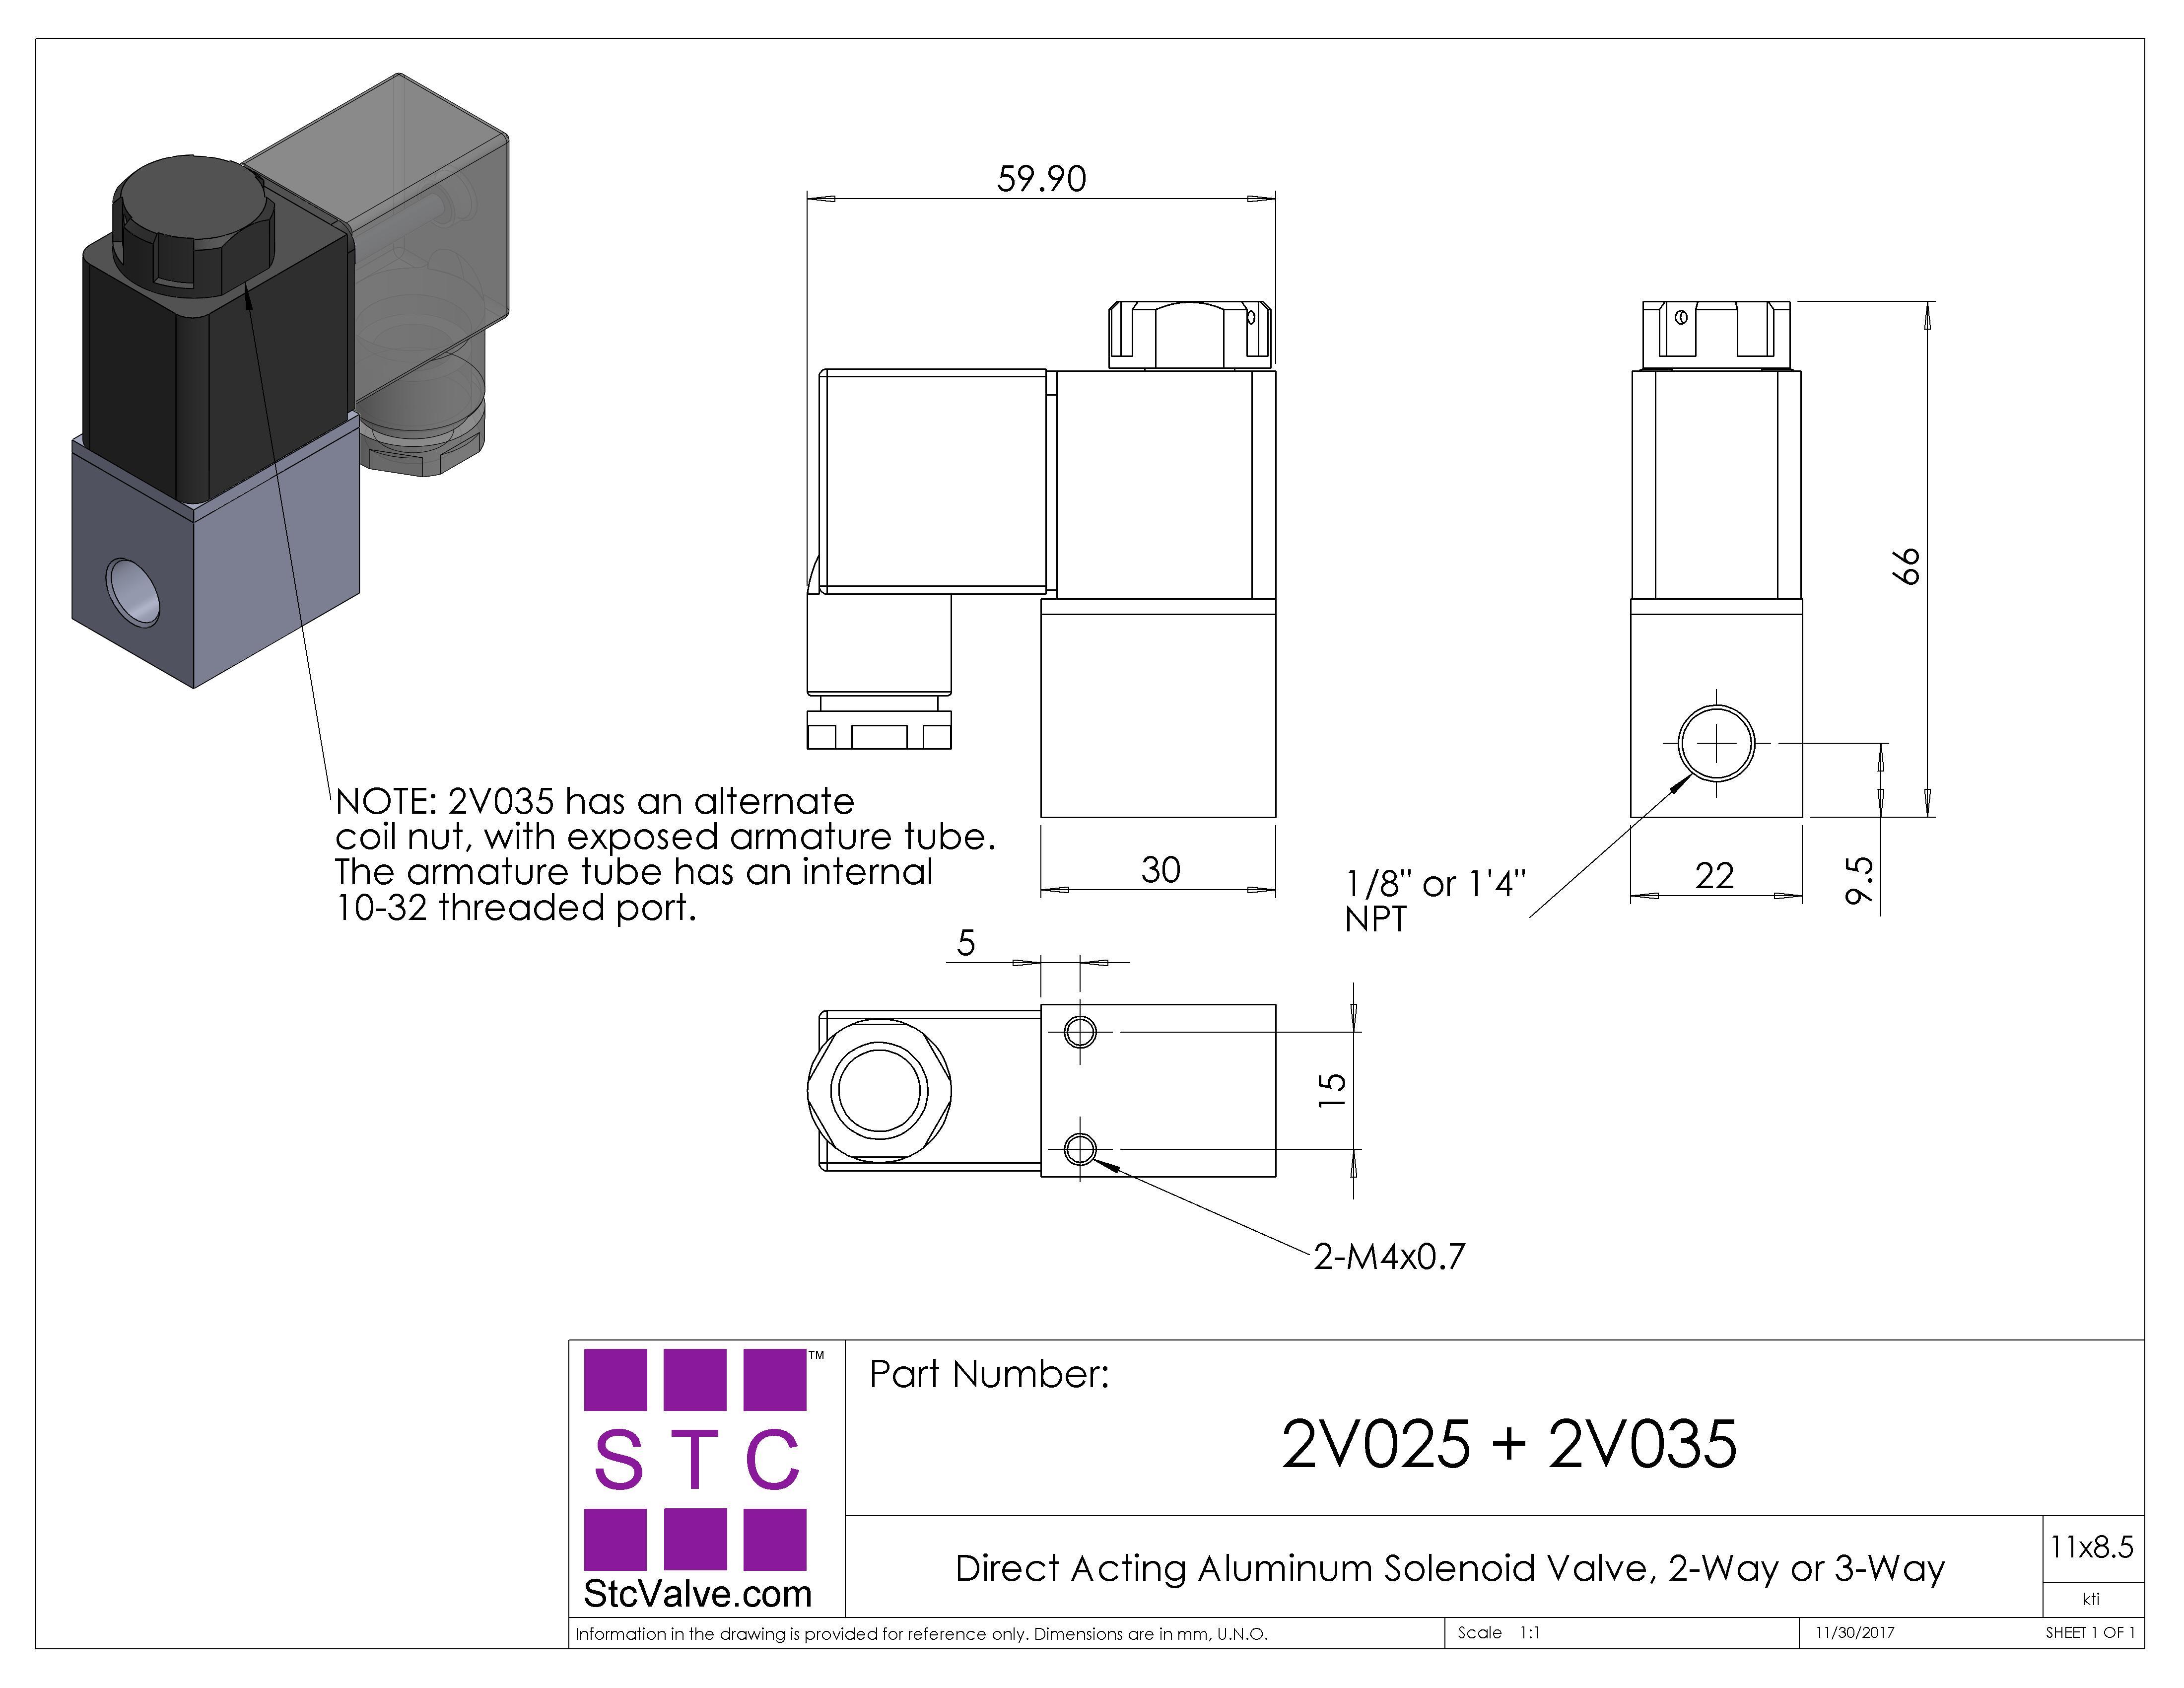 Solenoid Valve Wiring Diagram Online Wiring Diagram